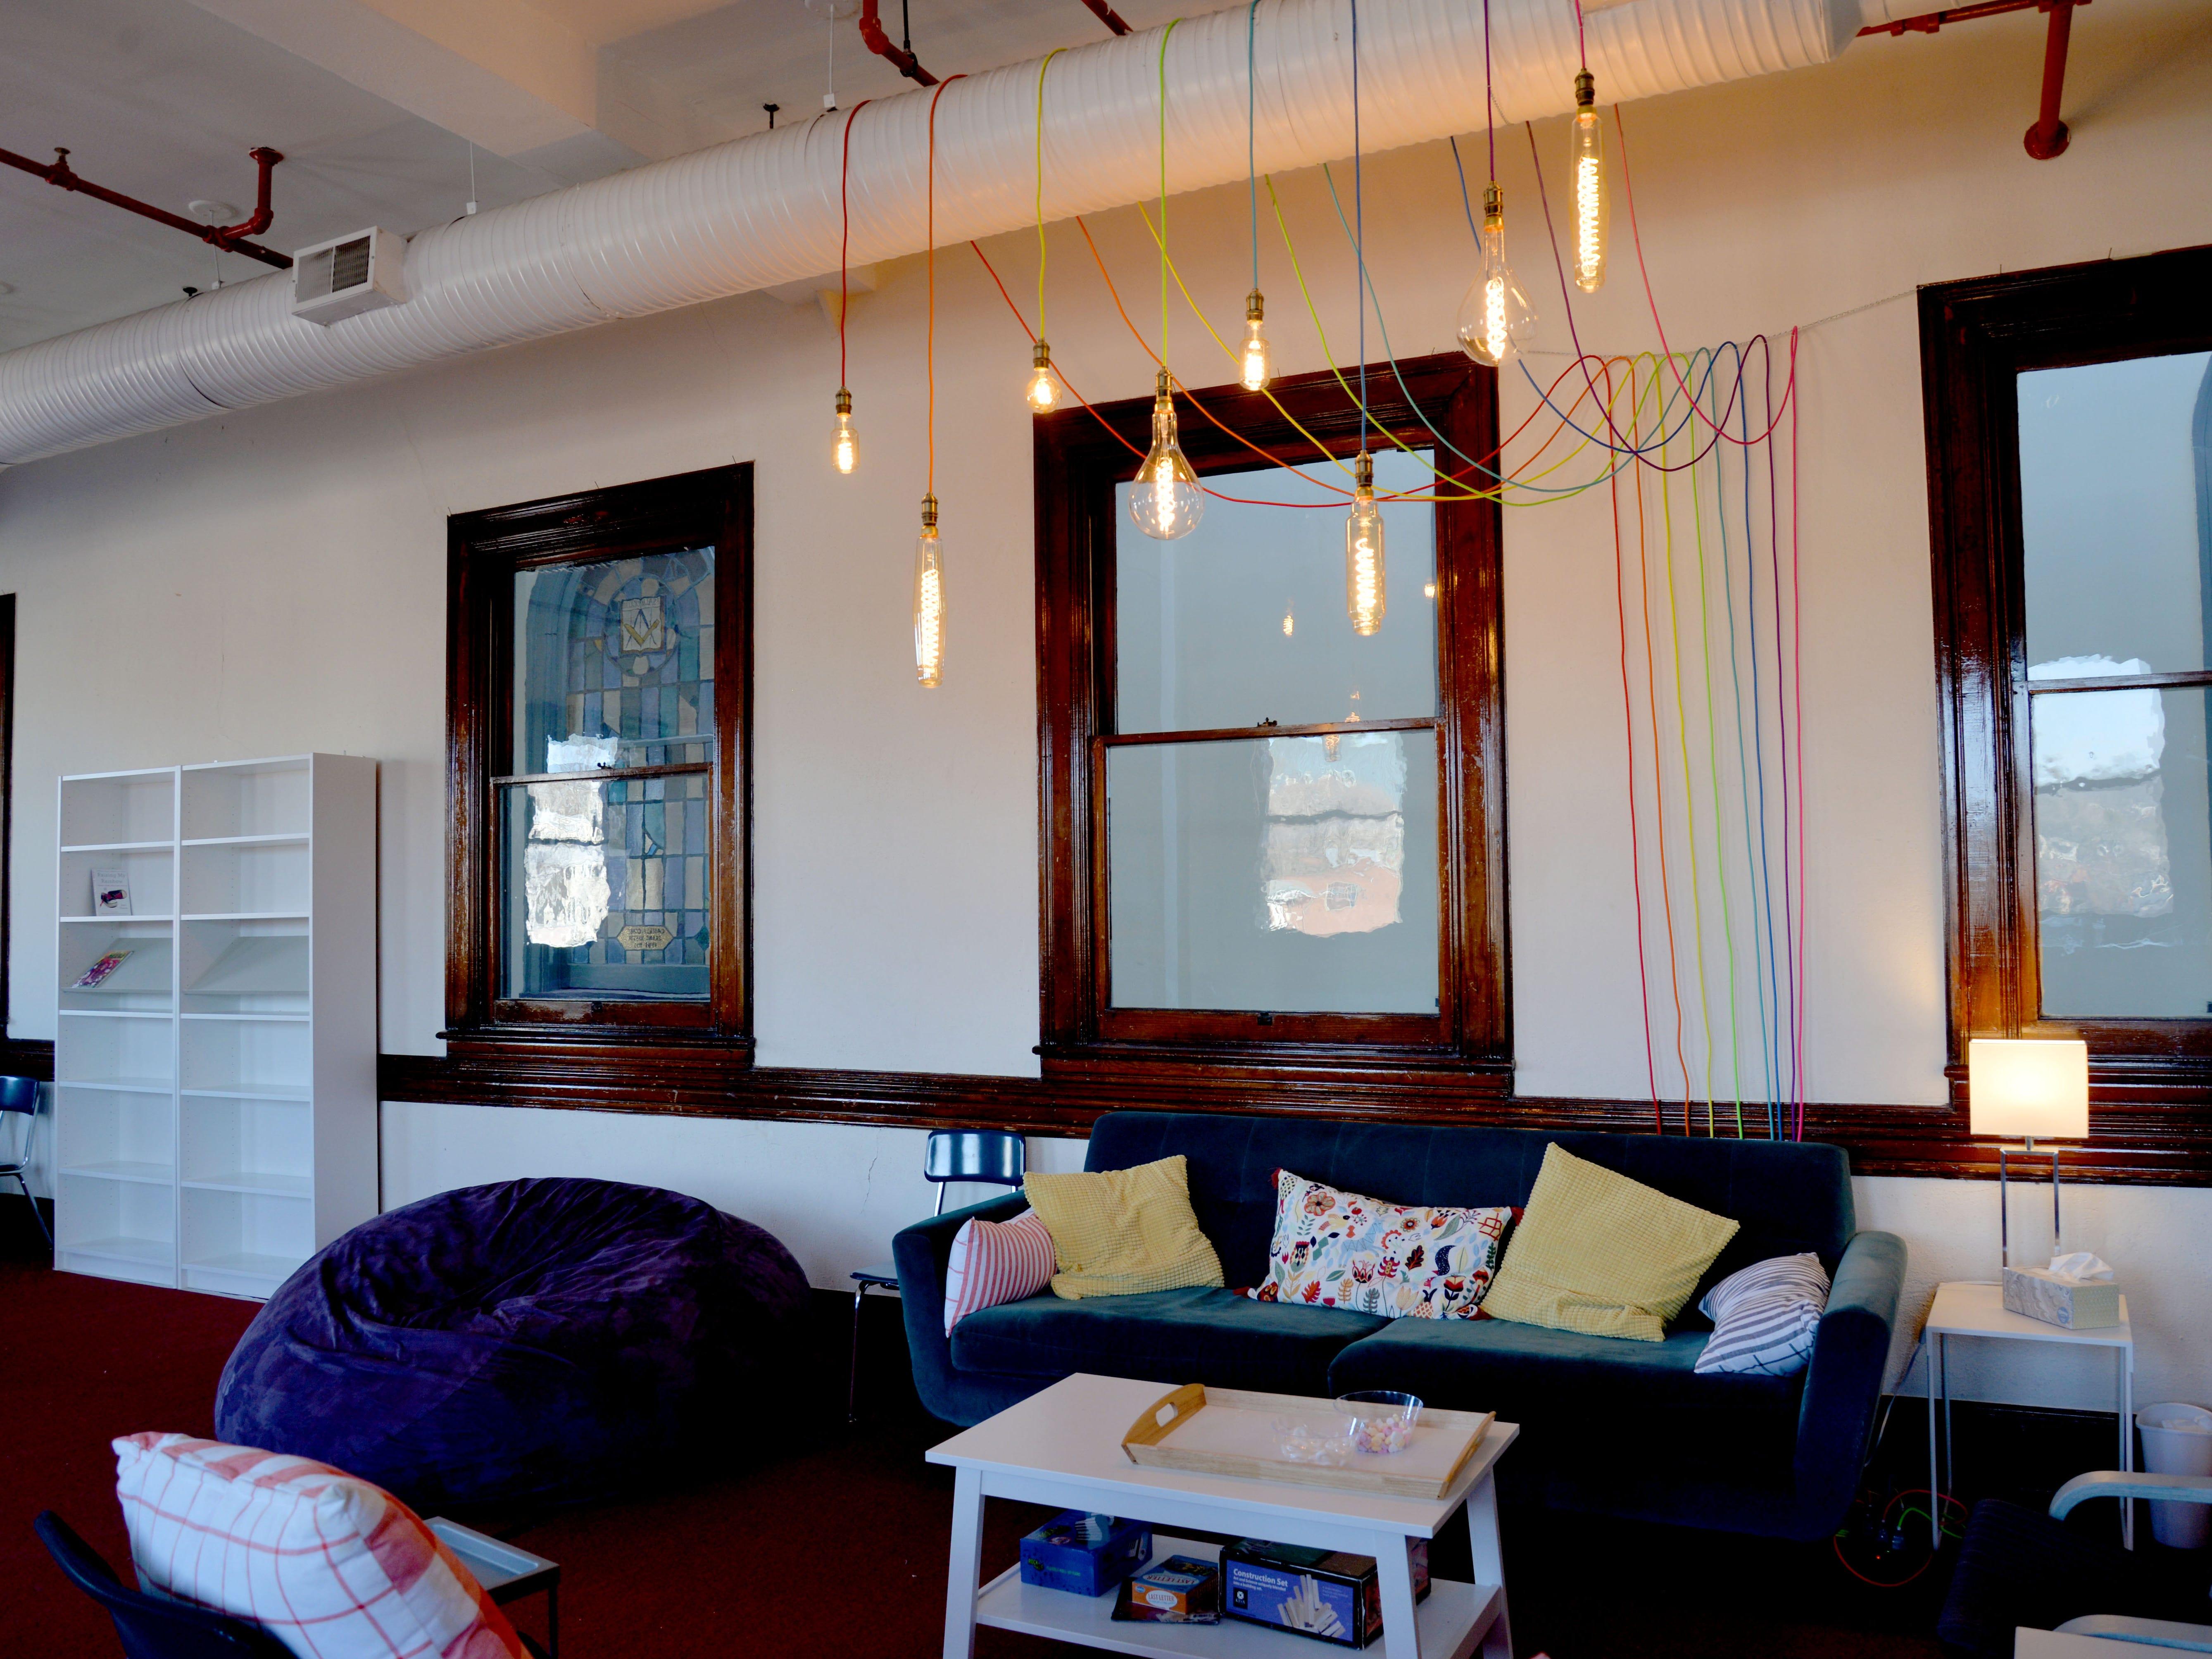 The Shenandoah LGBTQ Center has found a permanent home in Staunton's Masonic Building.